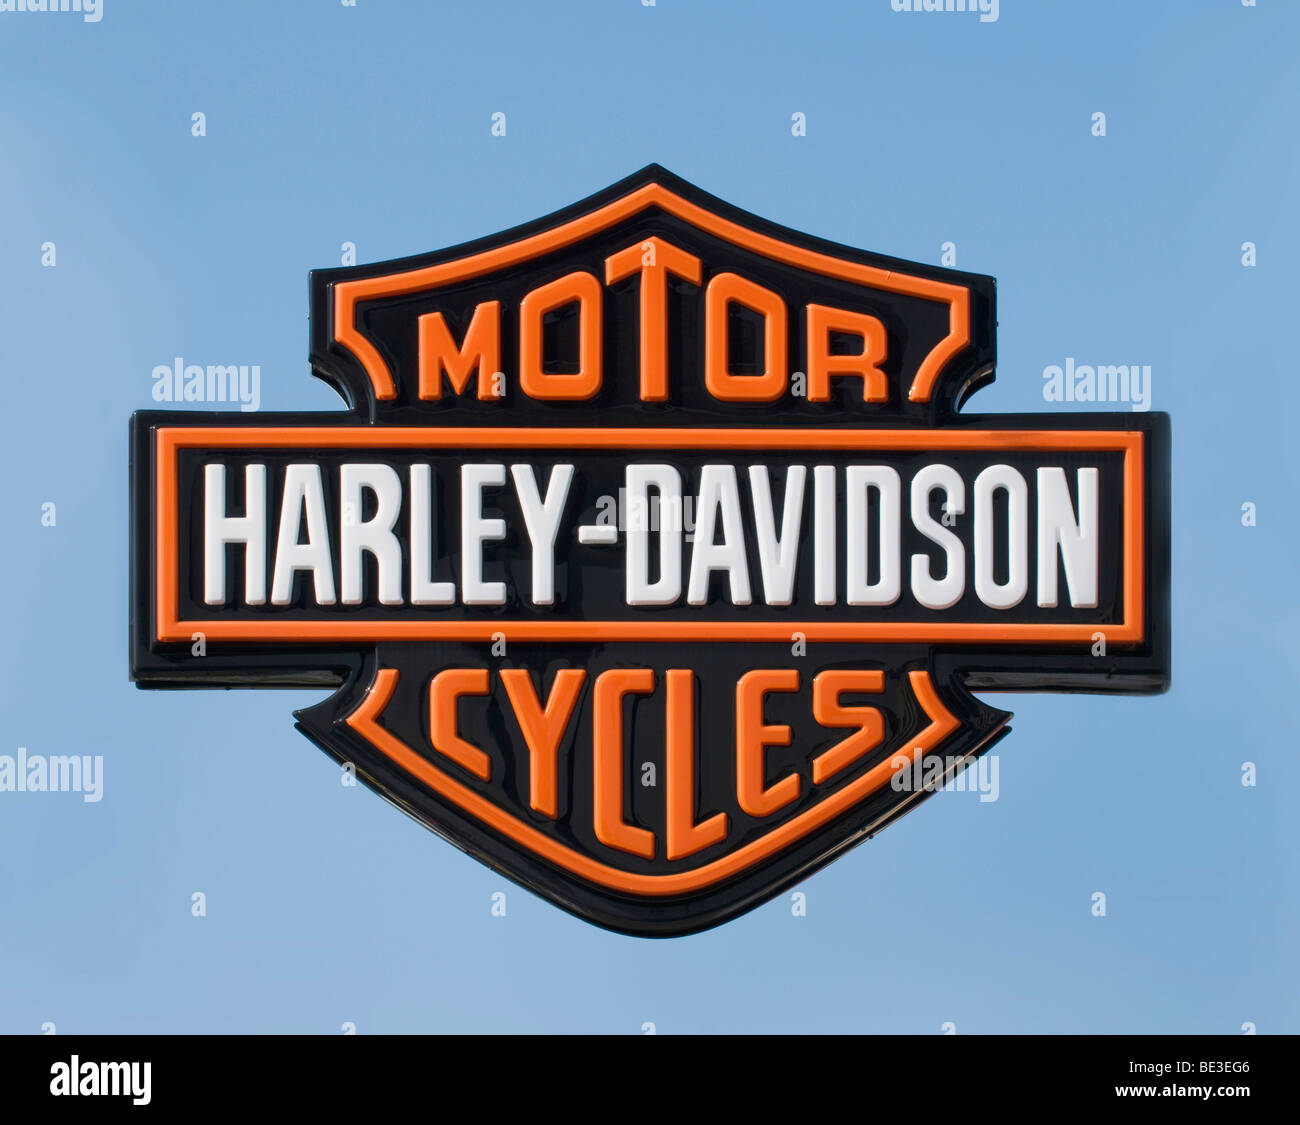 Logo Harley-Davidson motorcycles - Stock Image